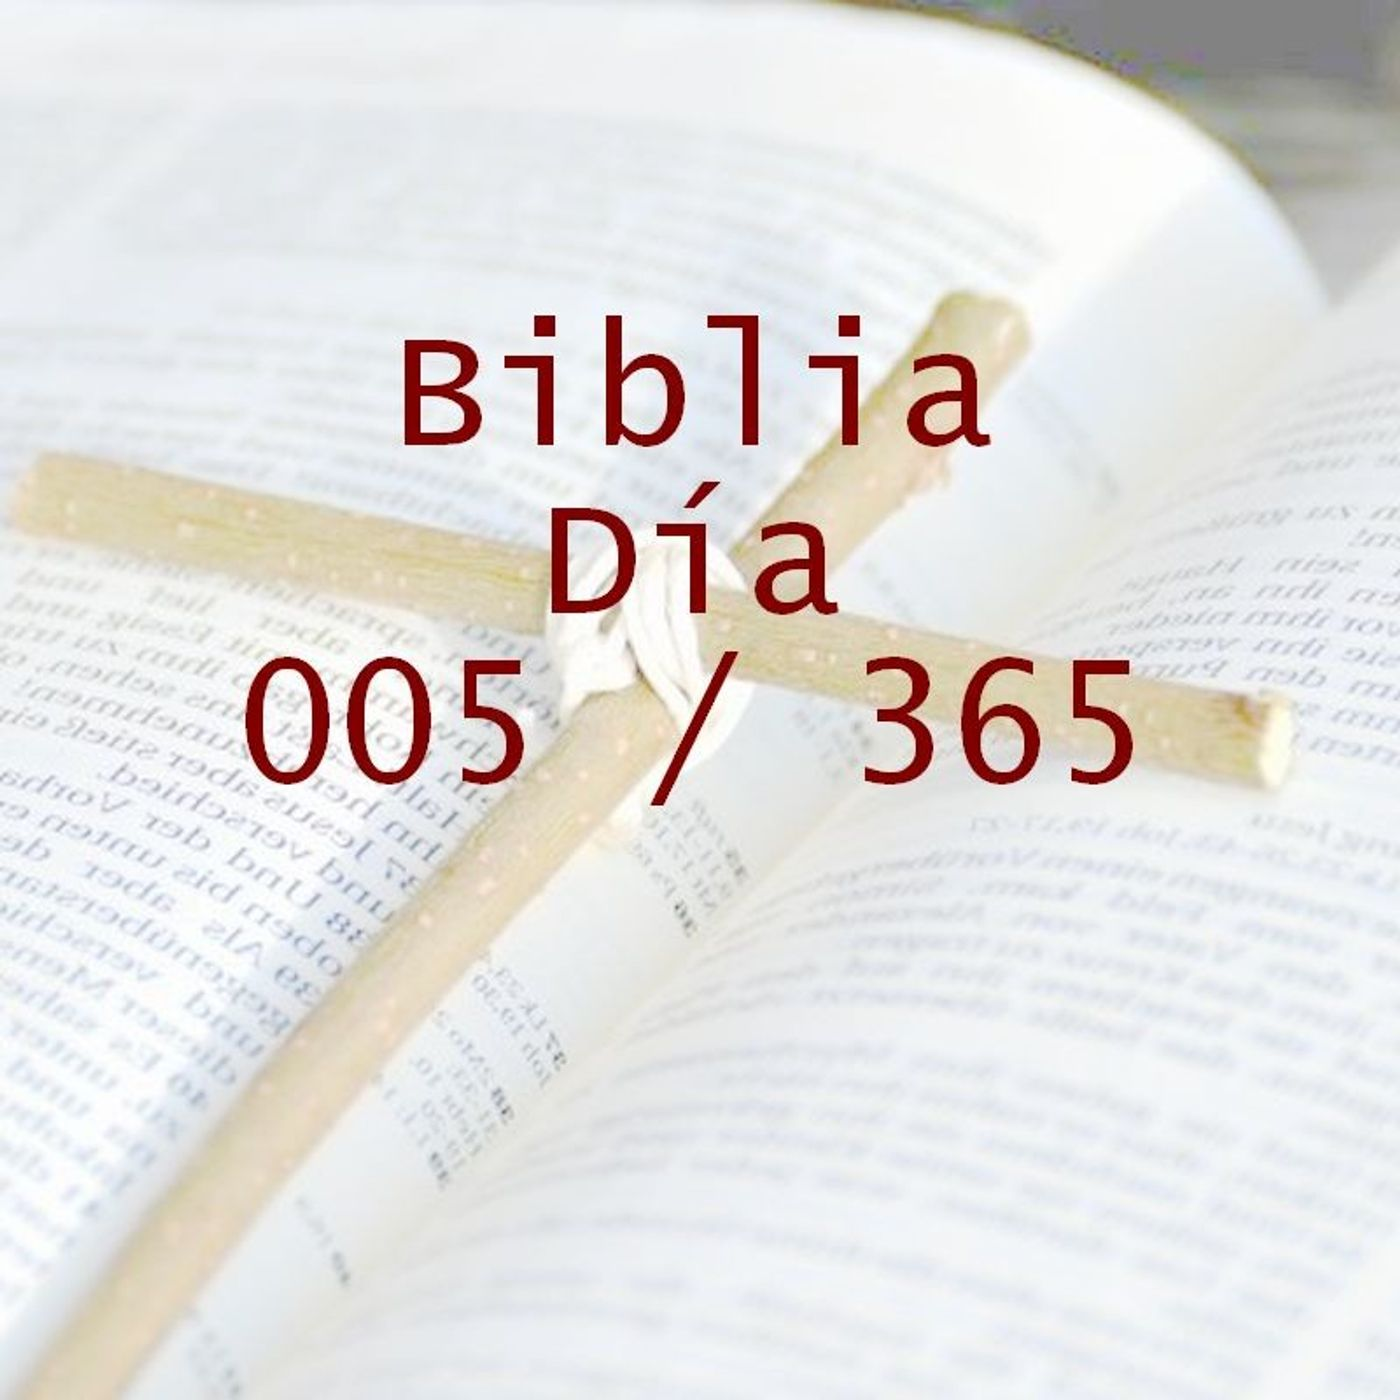 365 dias para la Biblia - Dia 005